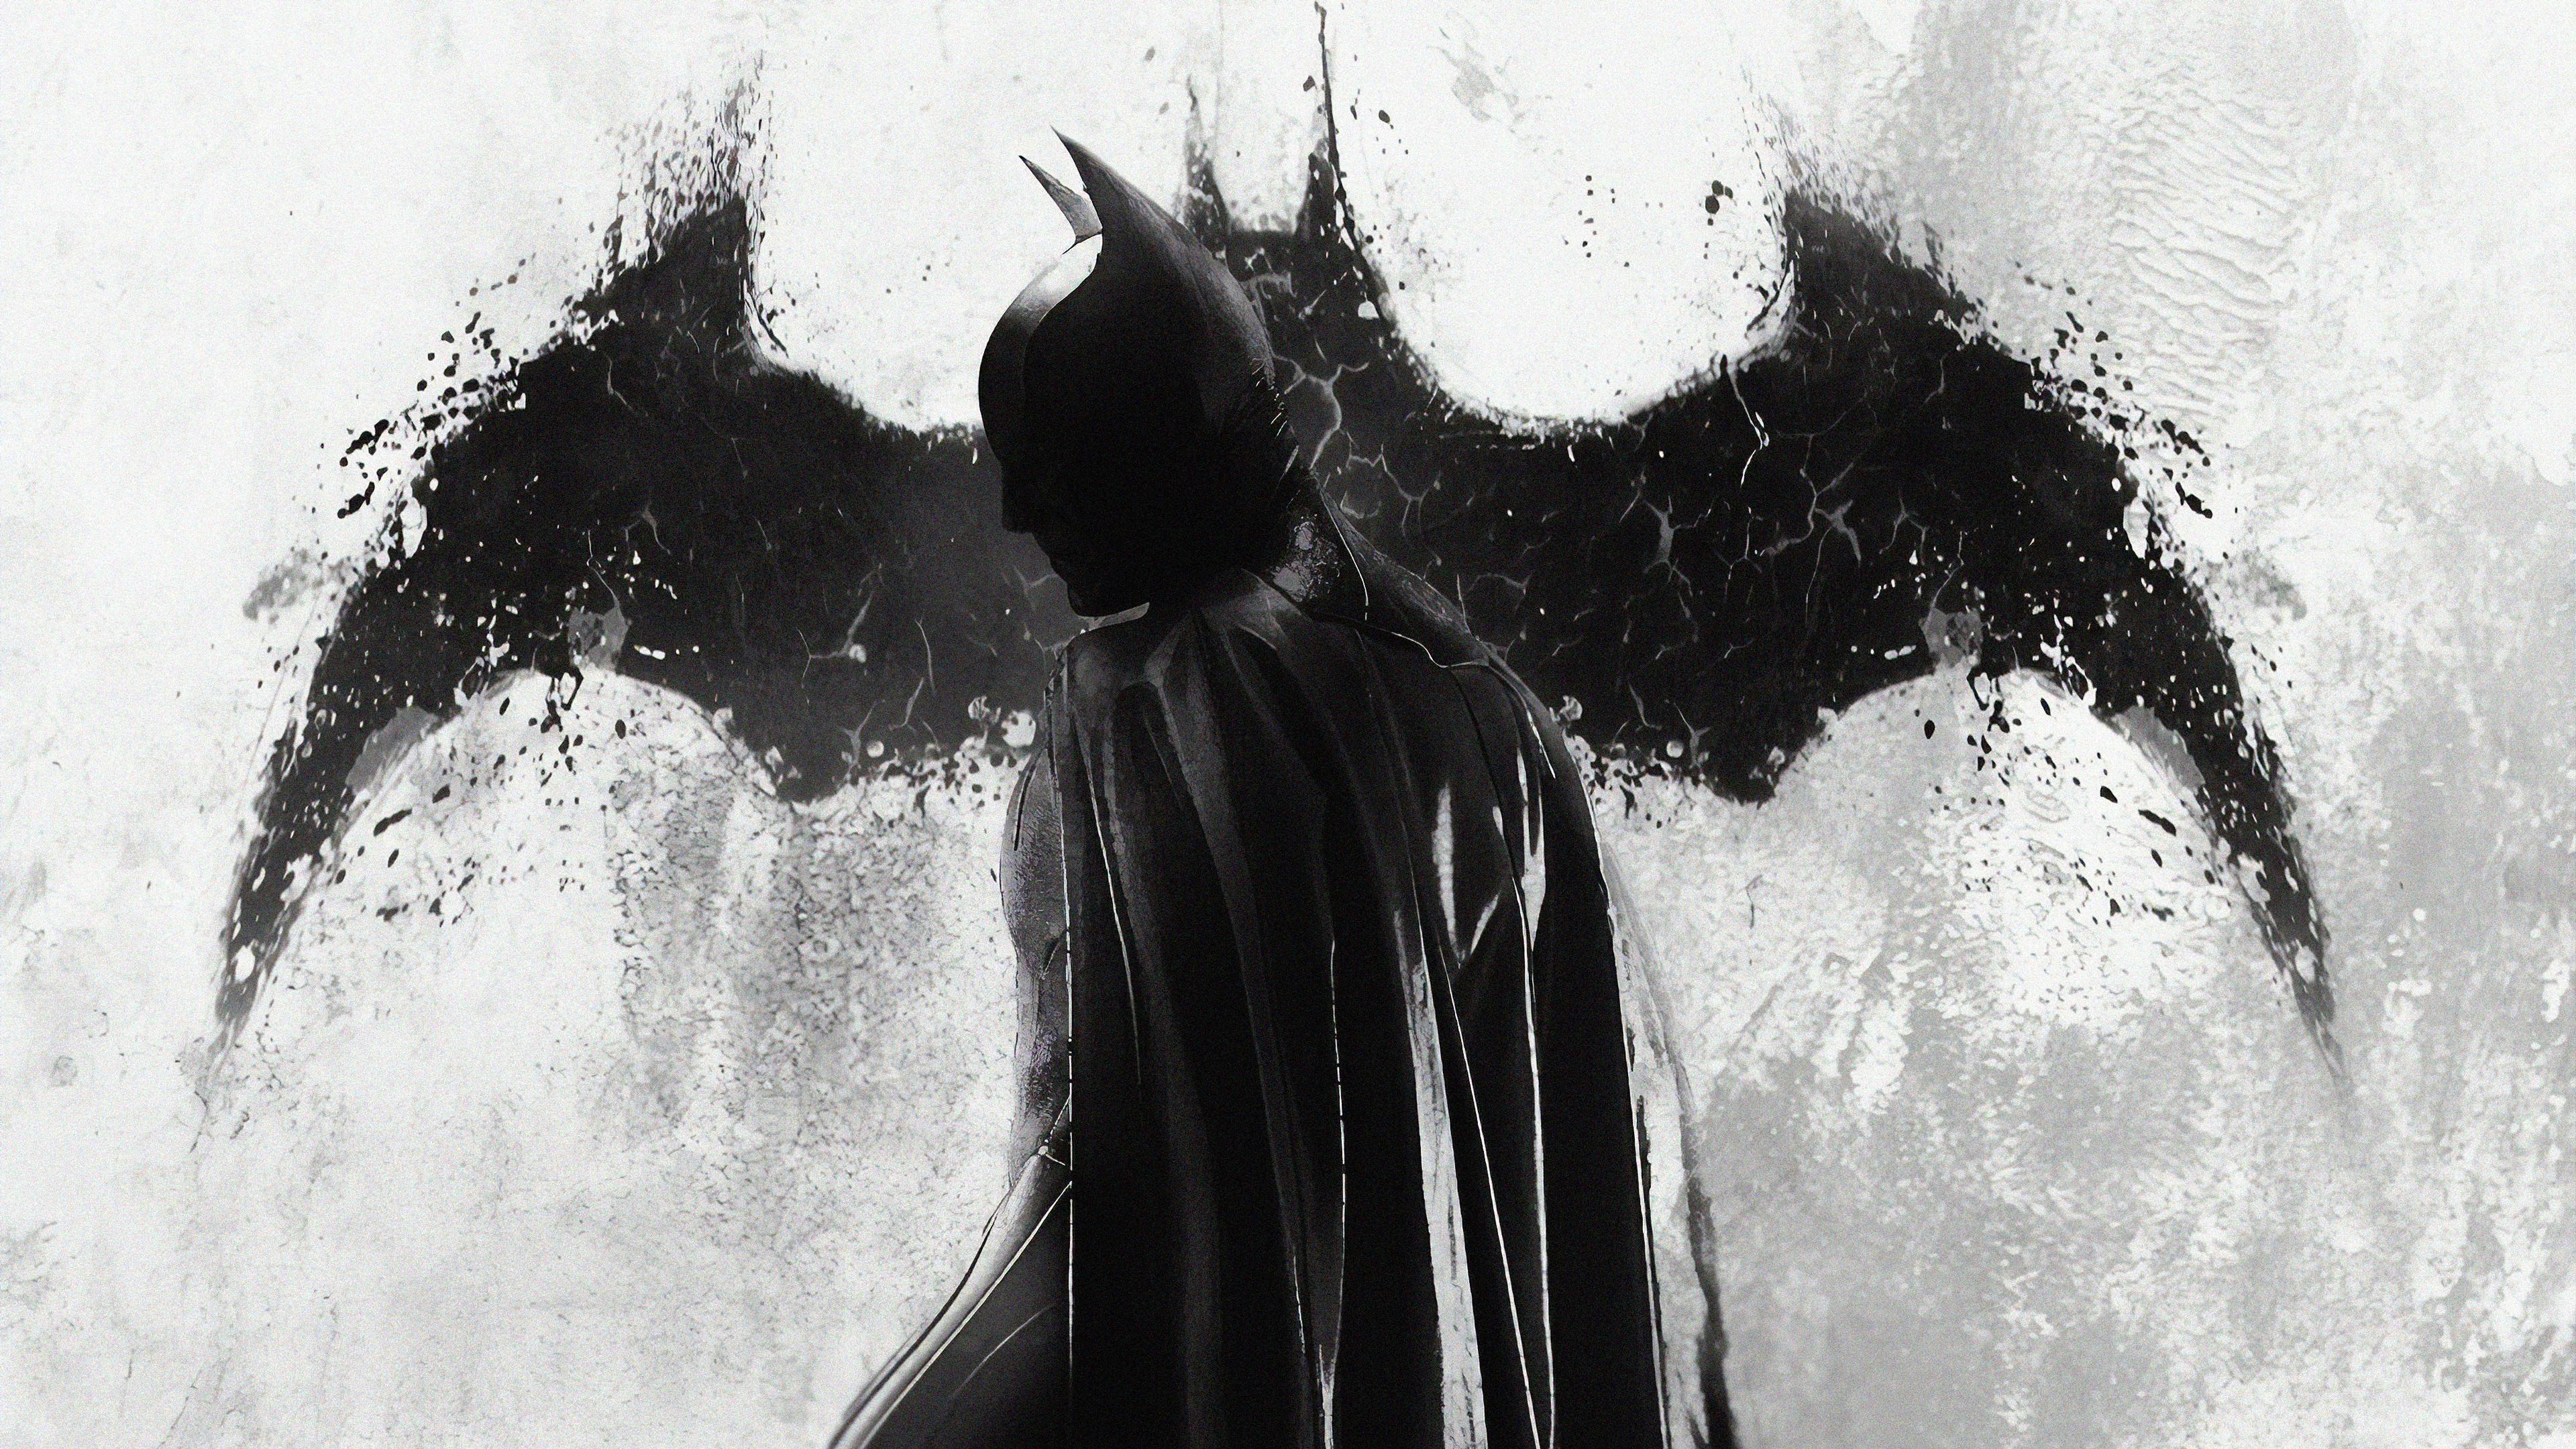 batman monochrome 1563220257 - Batman Monochrome - superheroes wallpapers, hd-wallpapers, digital art wallpapers, batman wallpapers, artwork wallpapers, 4k-wallpapers